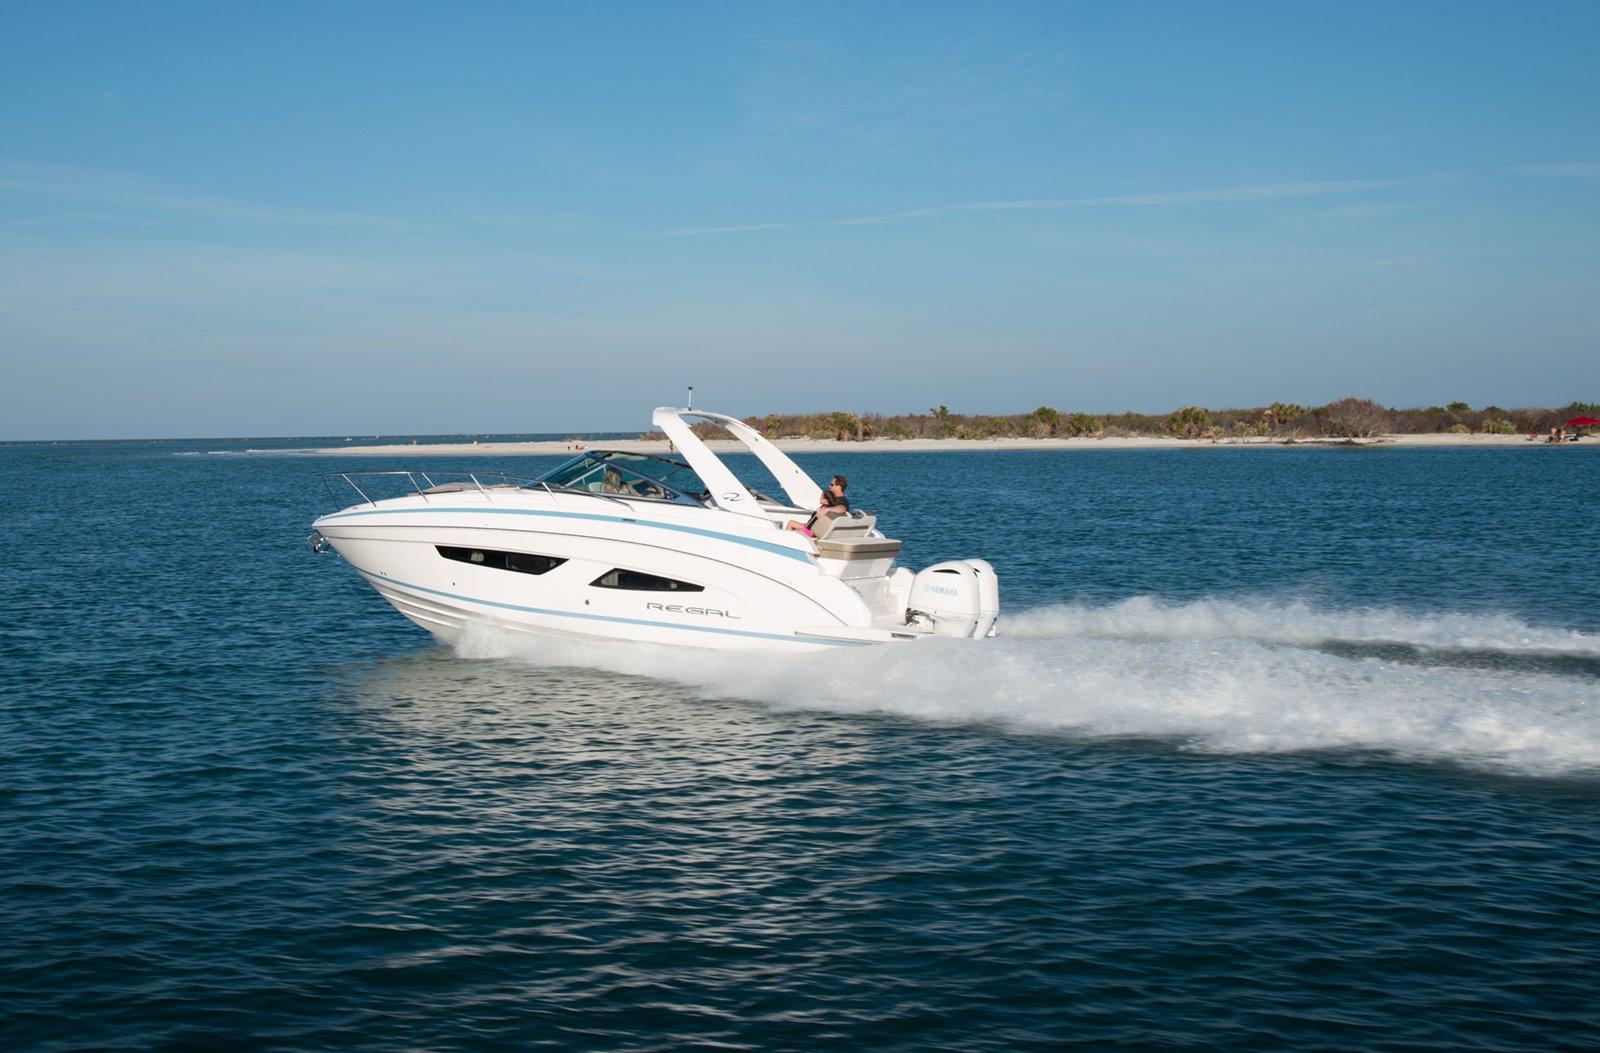 2021 Regal Outboard 33 XO